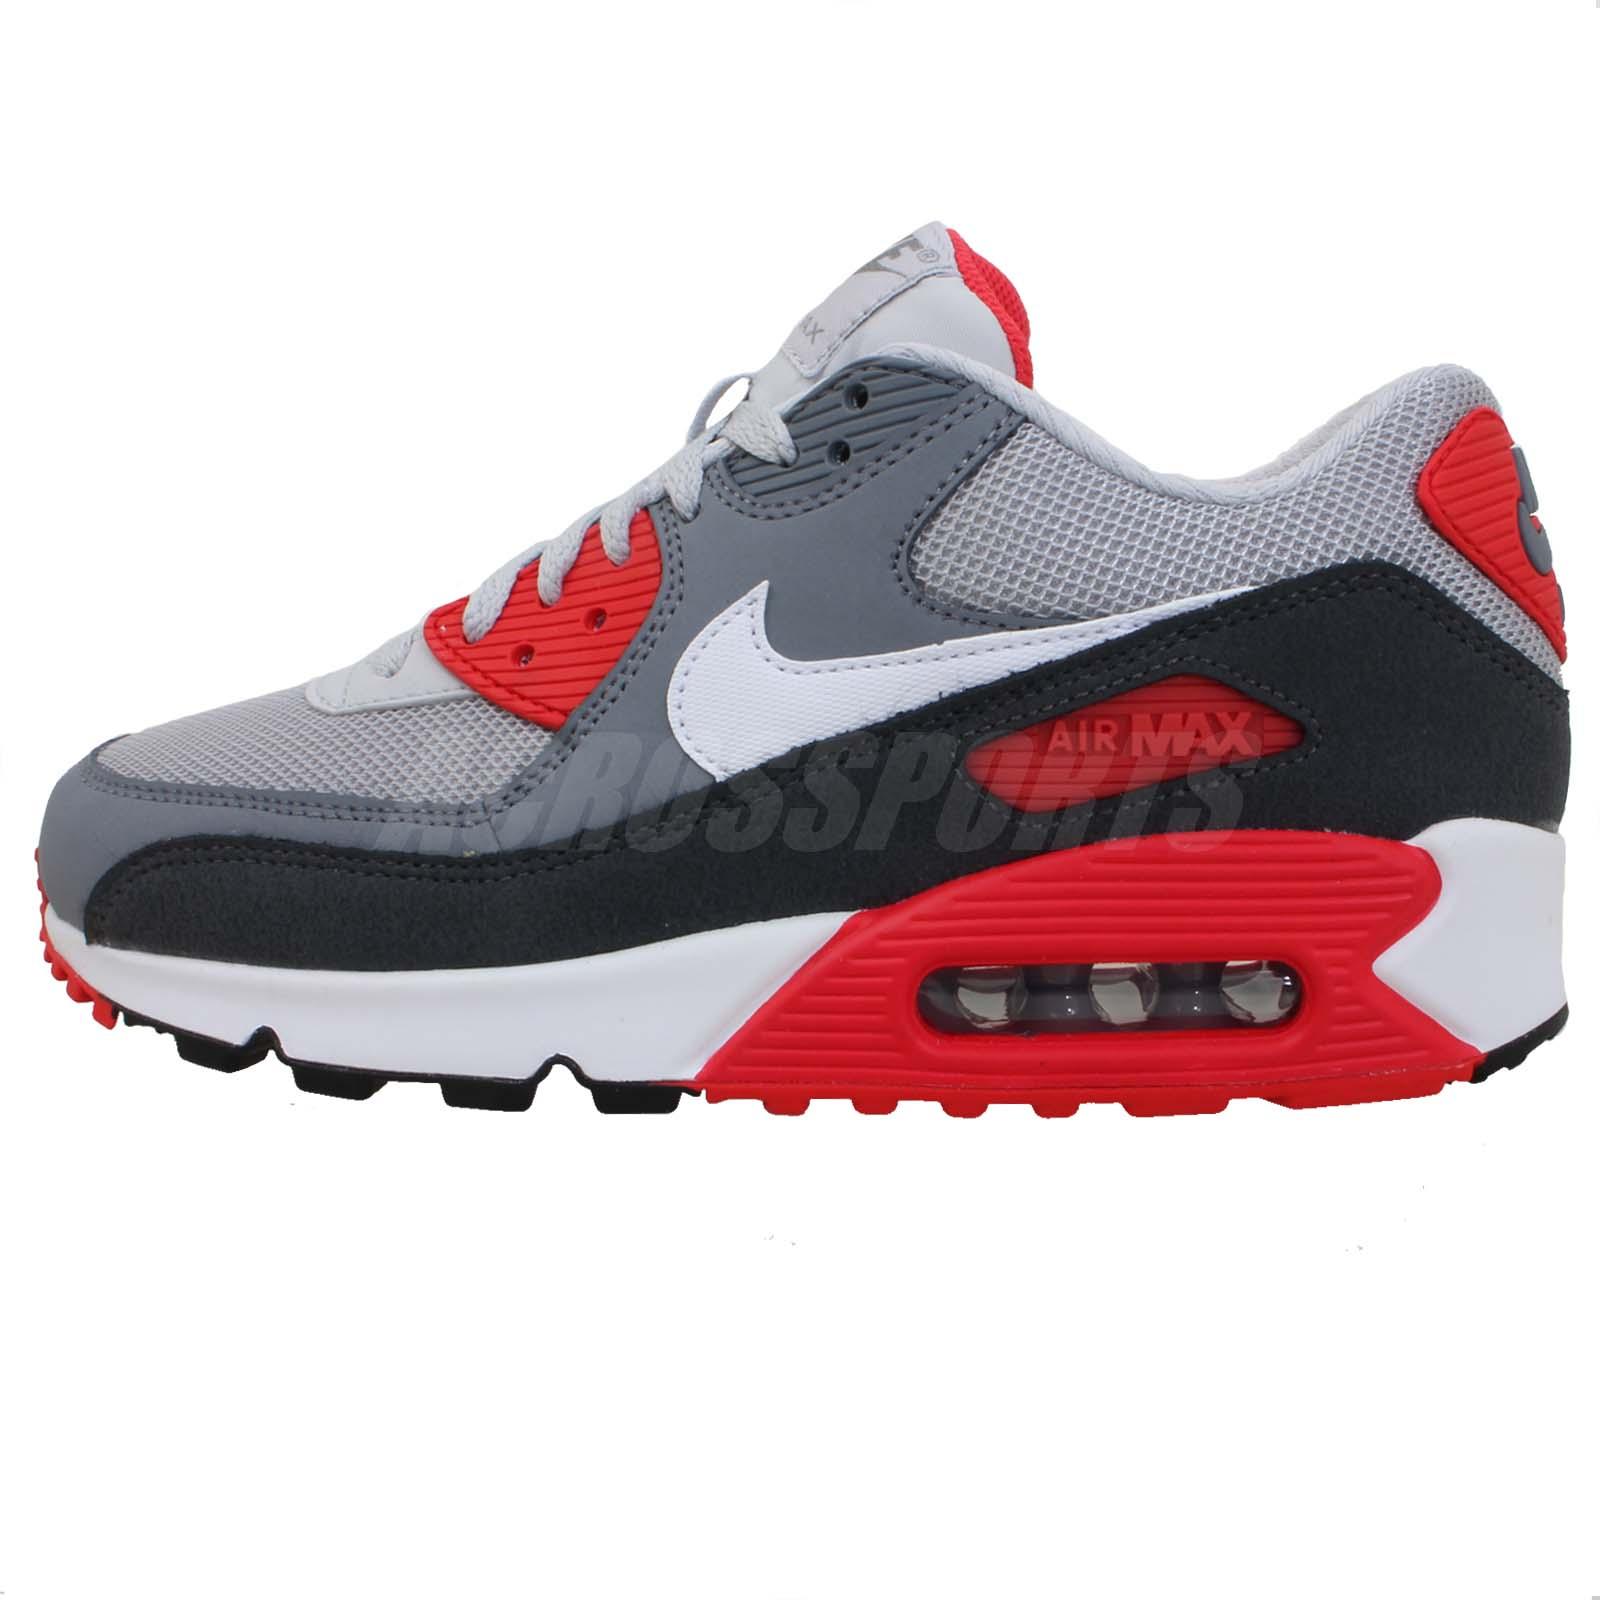 Nike Air Max 90 Essential 2013 Grey Black Red Mens NSW Sportswear Running Shoes   eBay